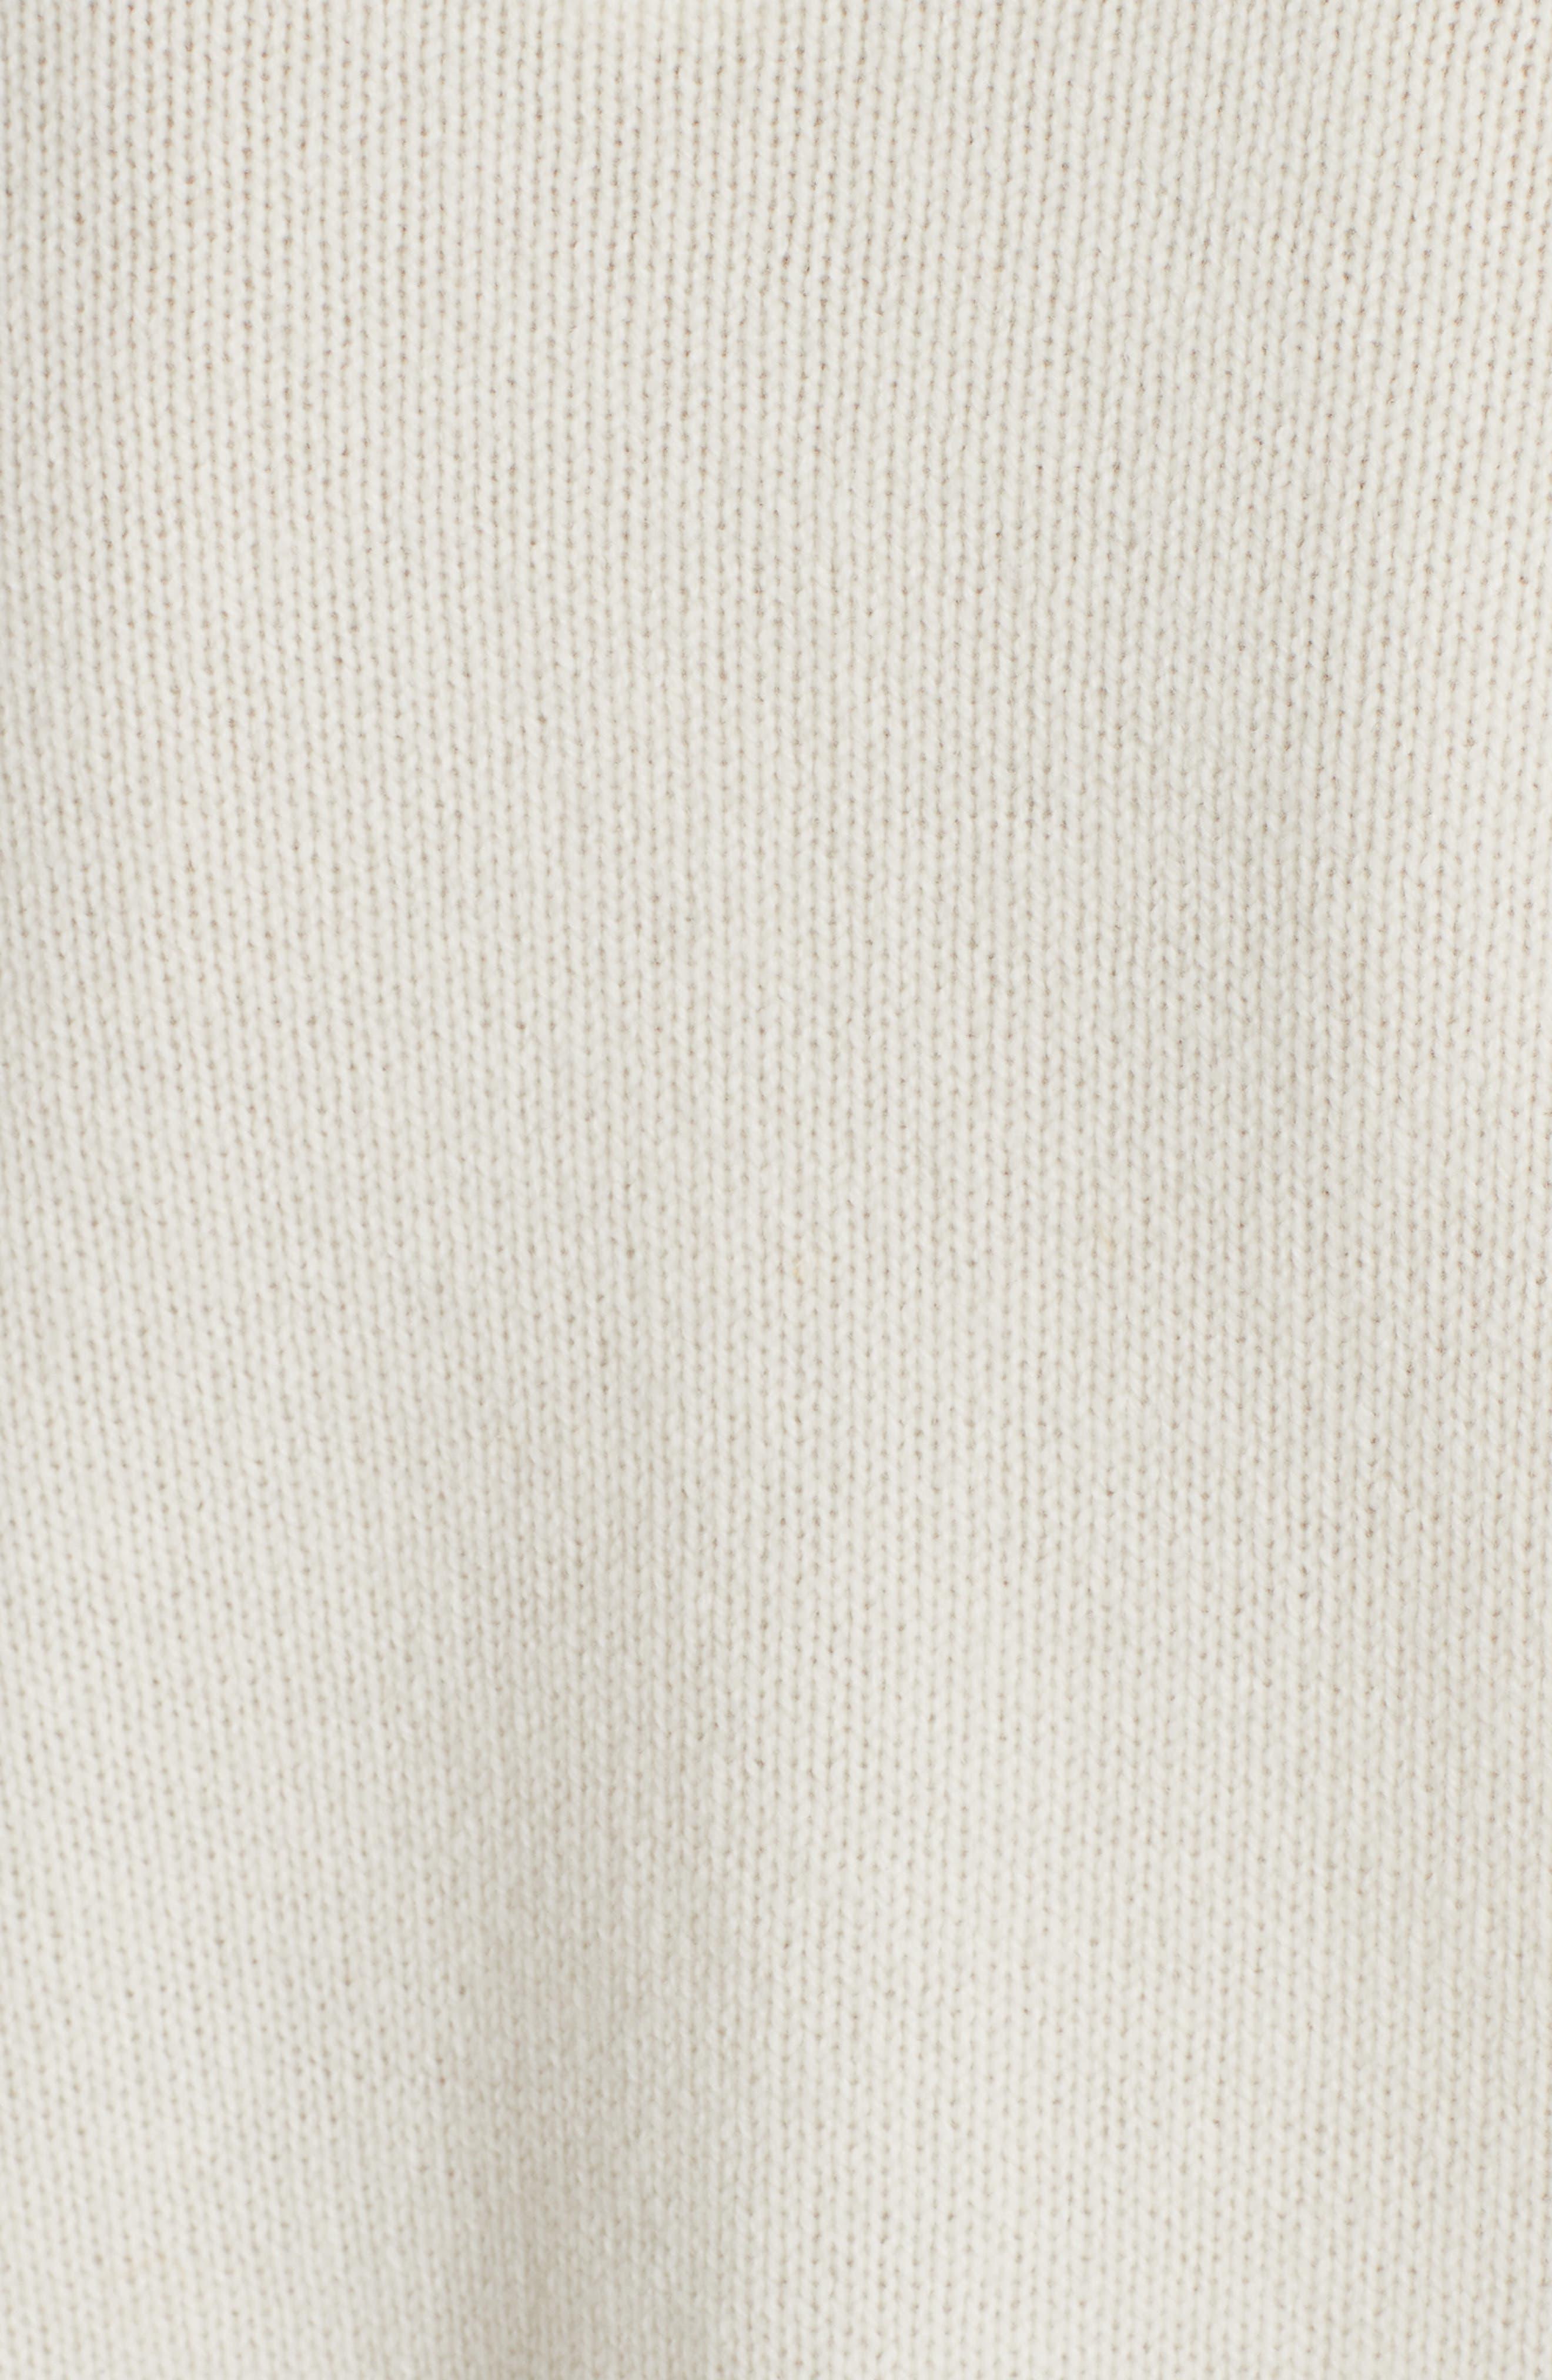 Bear Wool Sweater,                             Alternate thumbnail 5, color,                             CREAM